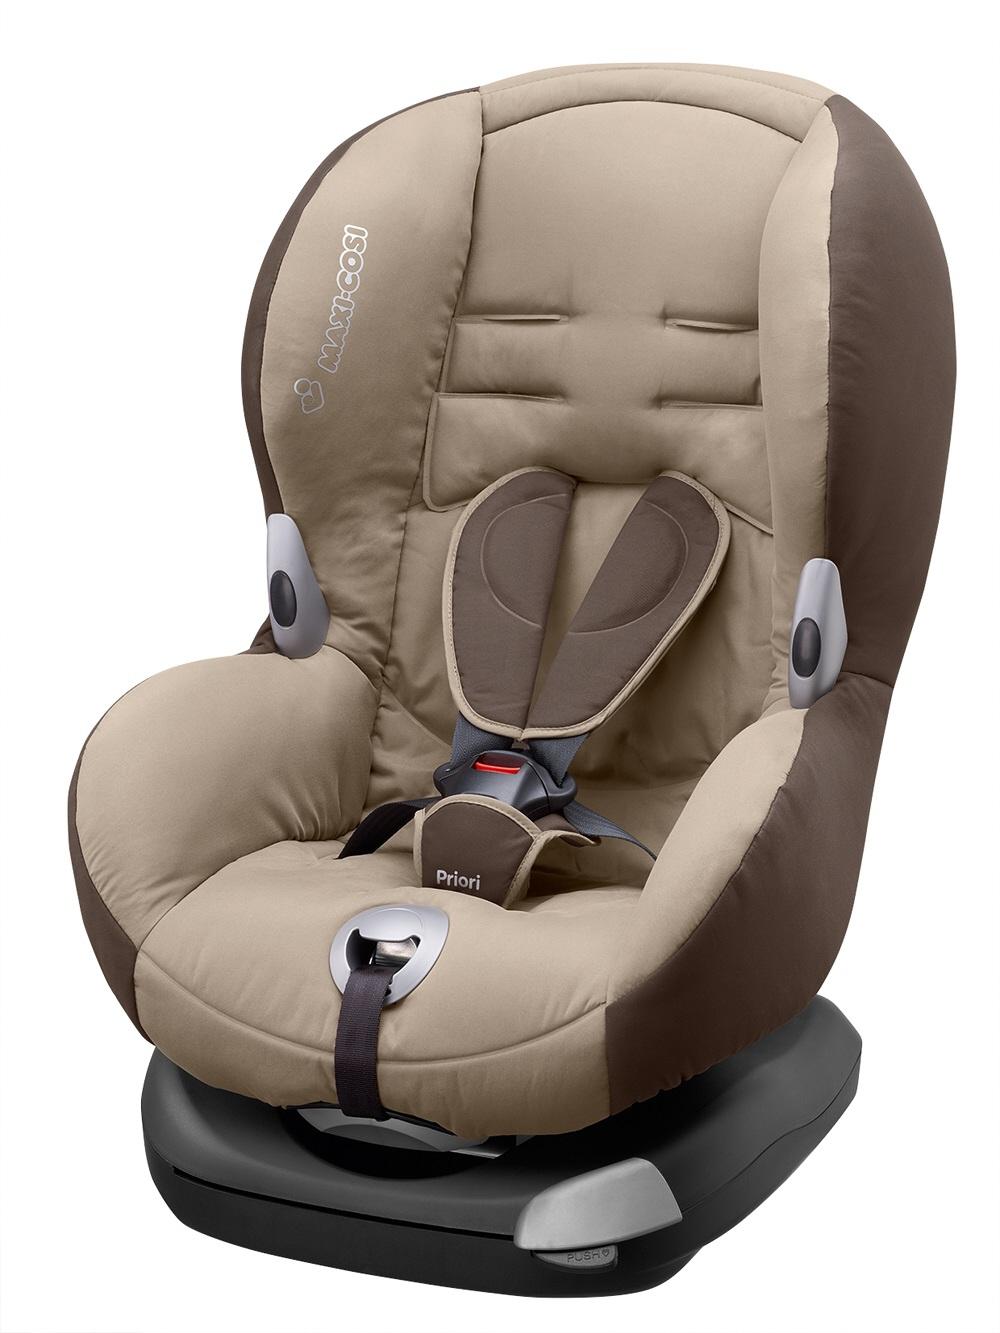 Black Maxi Cosi Car Seat Cover